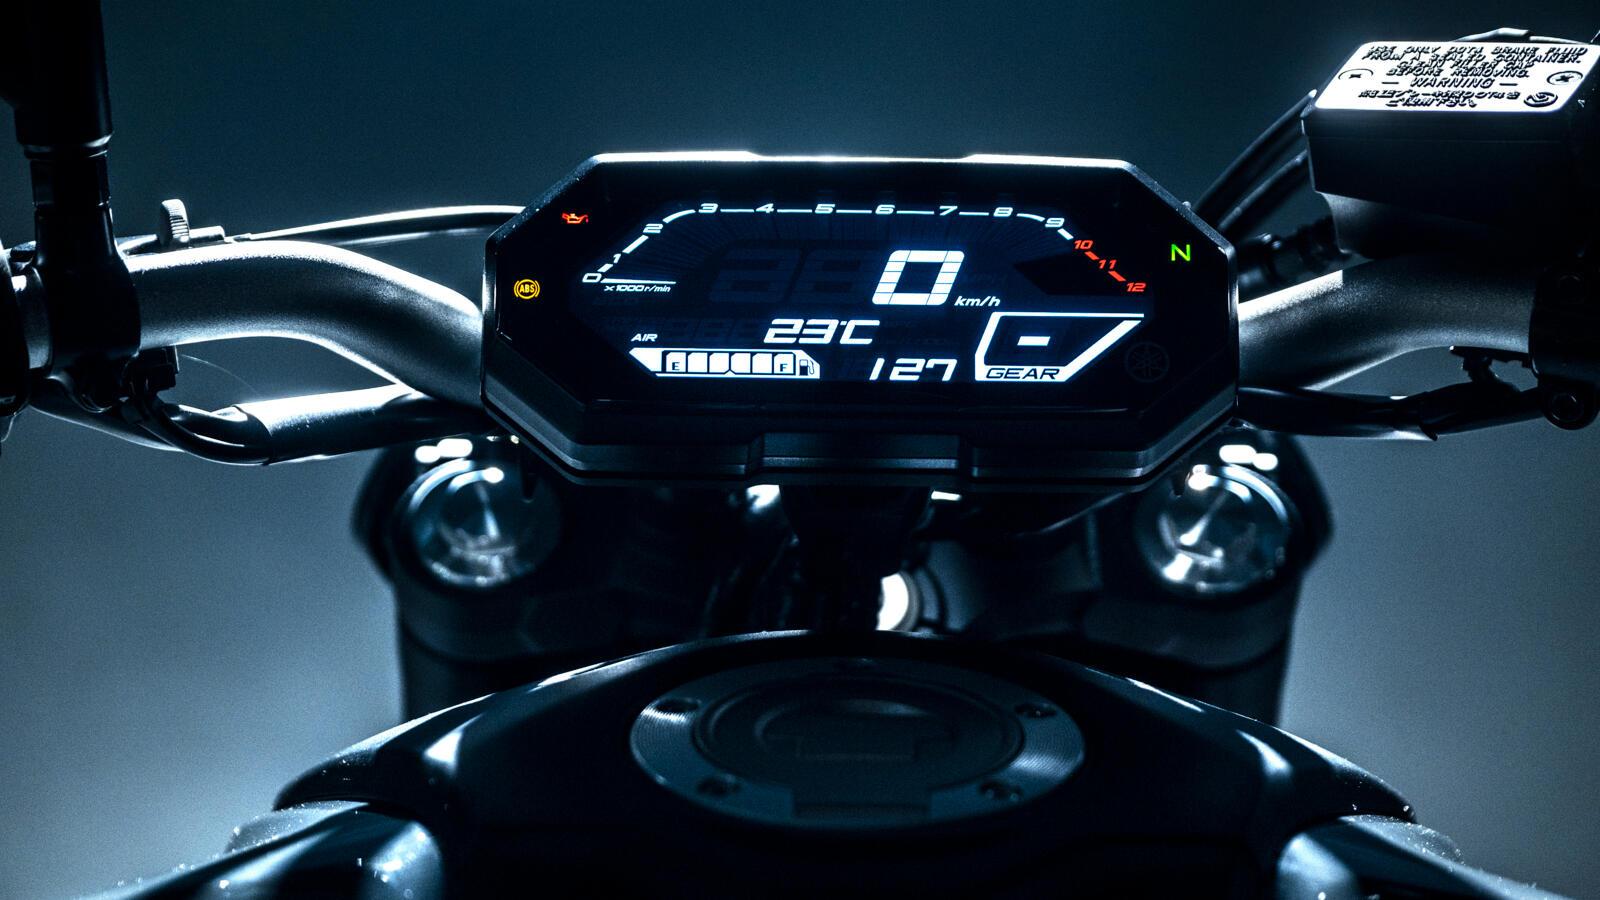 Yamaha-MT-07-my2021-17